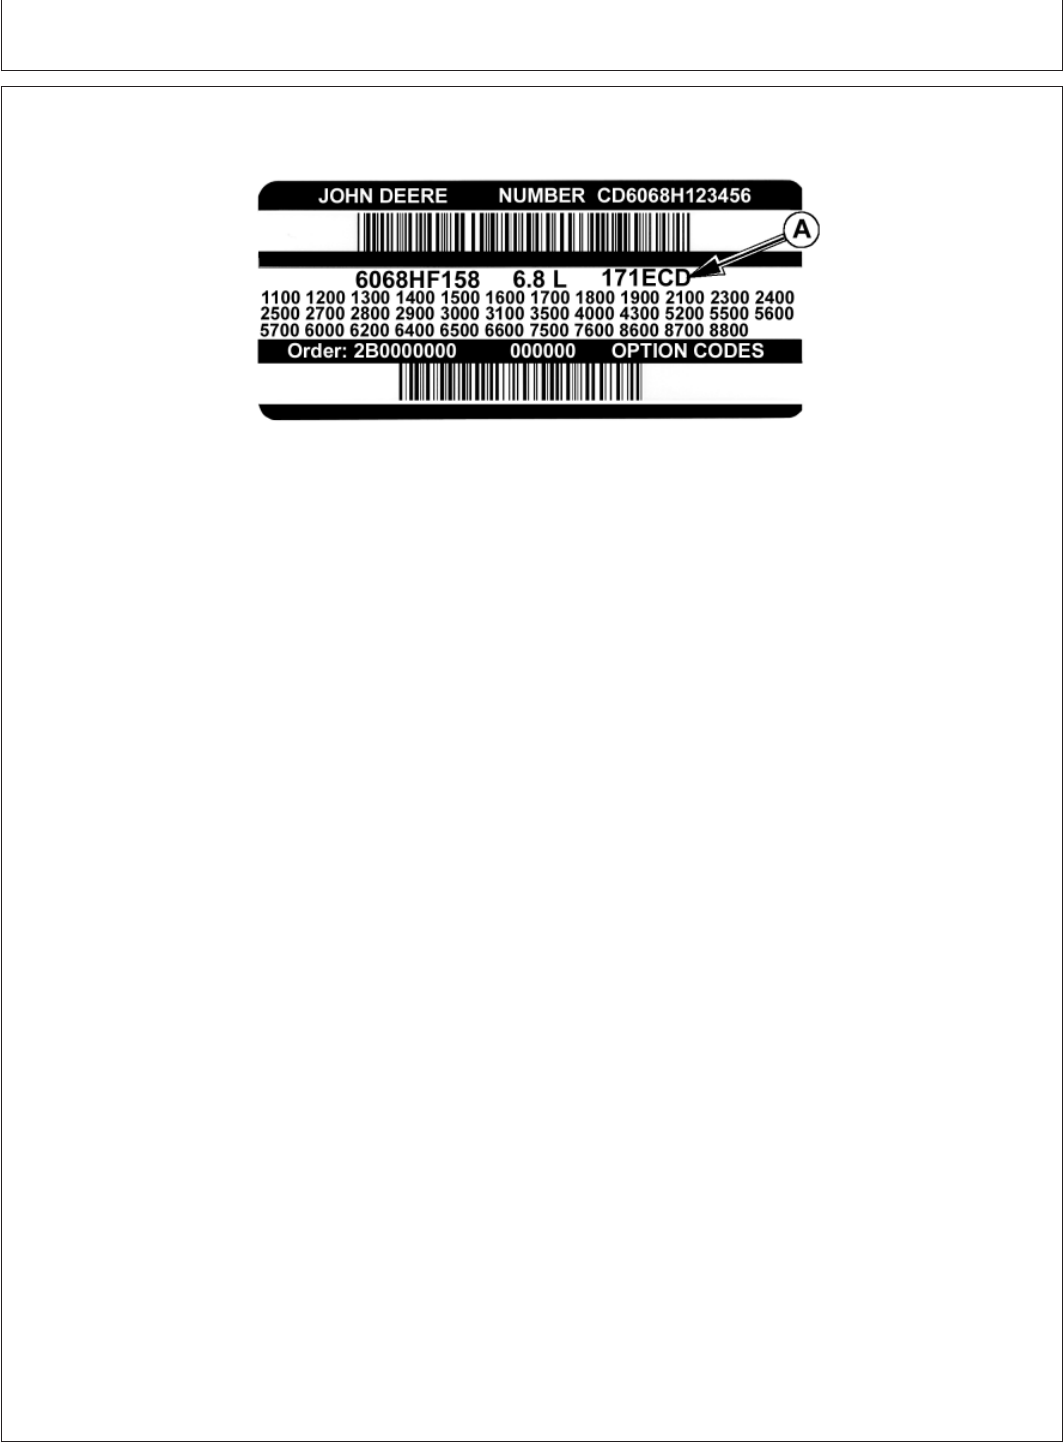 John Deere Cd4039df008 Users Manual Y40012unit 6200 Fuse Box Diagram Record Keeping